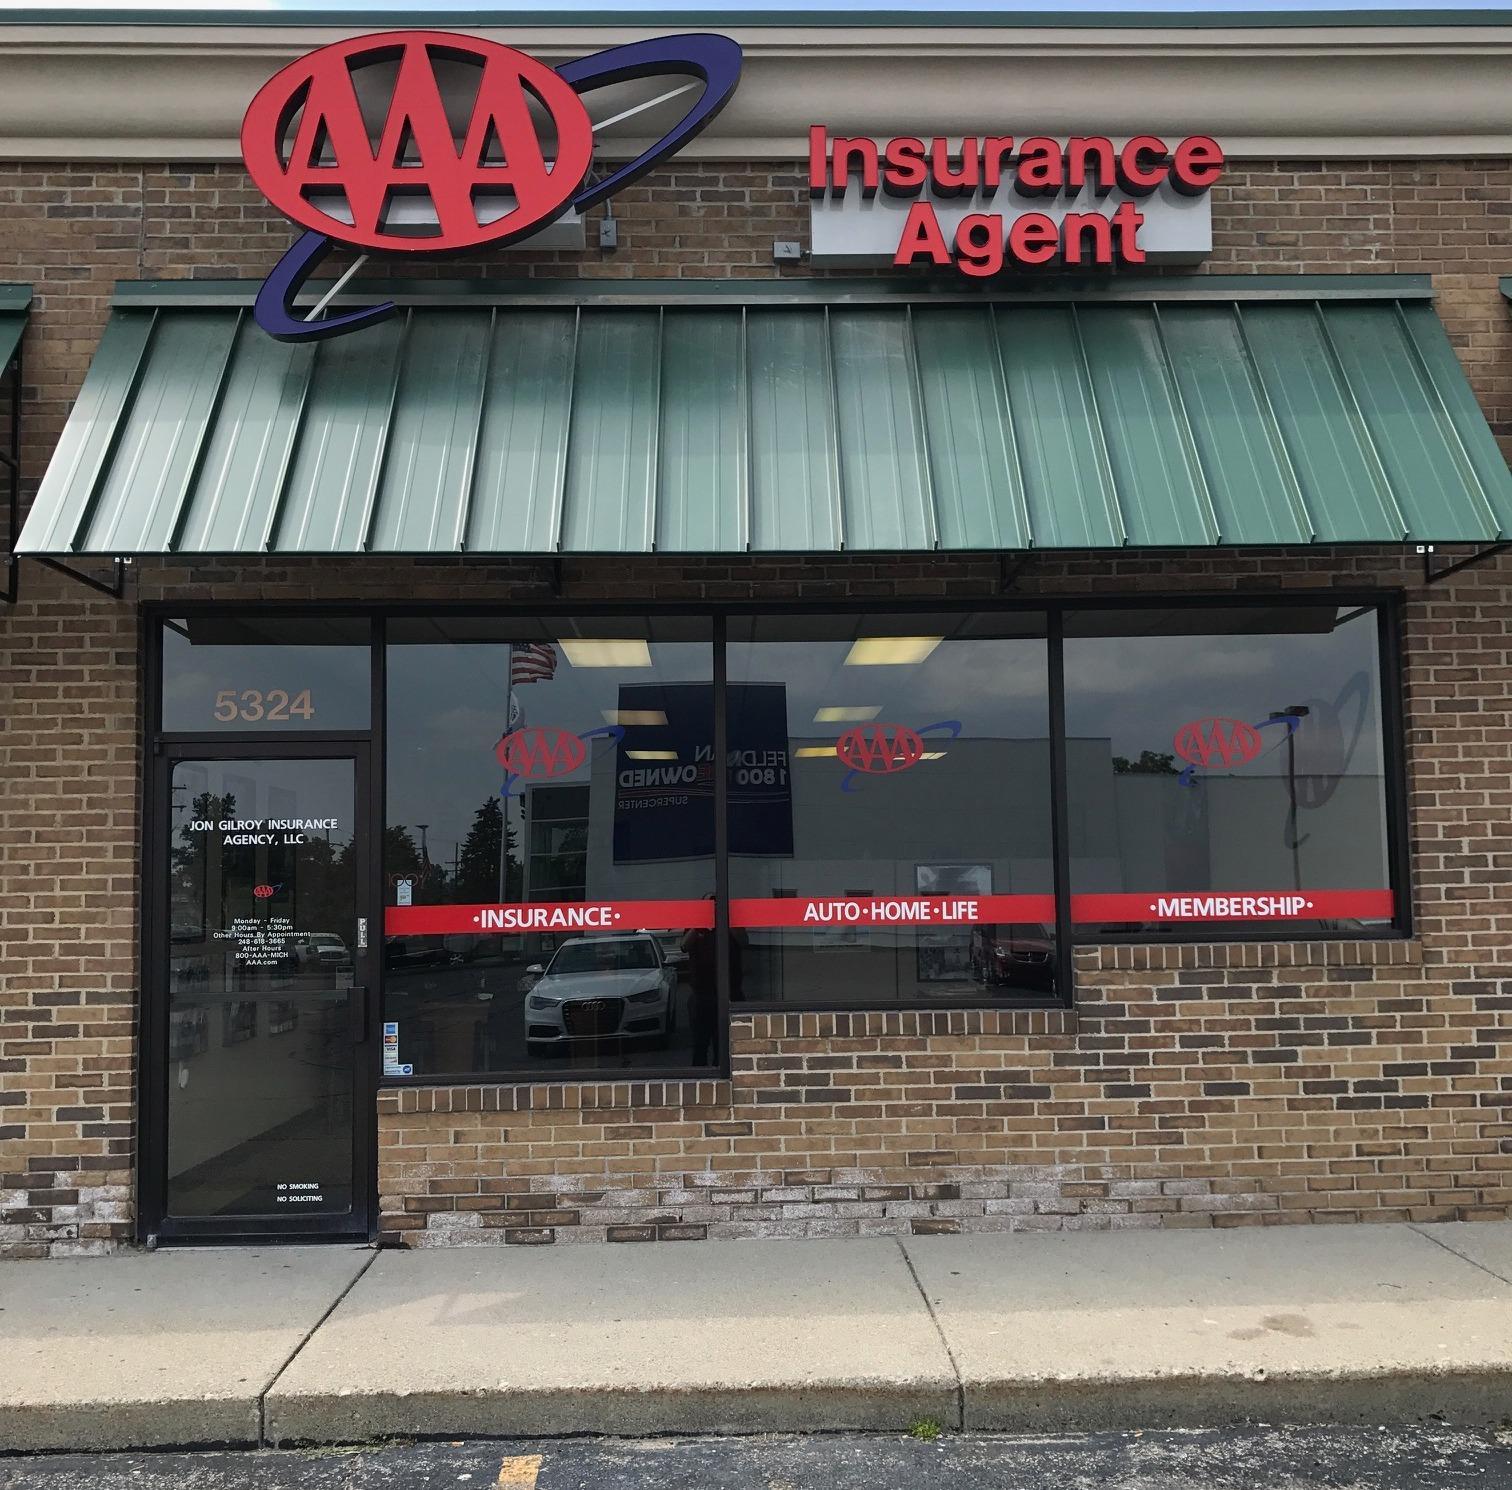 AAA Waterford - Jon Gilroy Insurance Agency